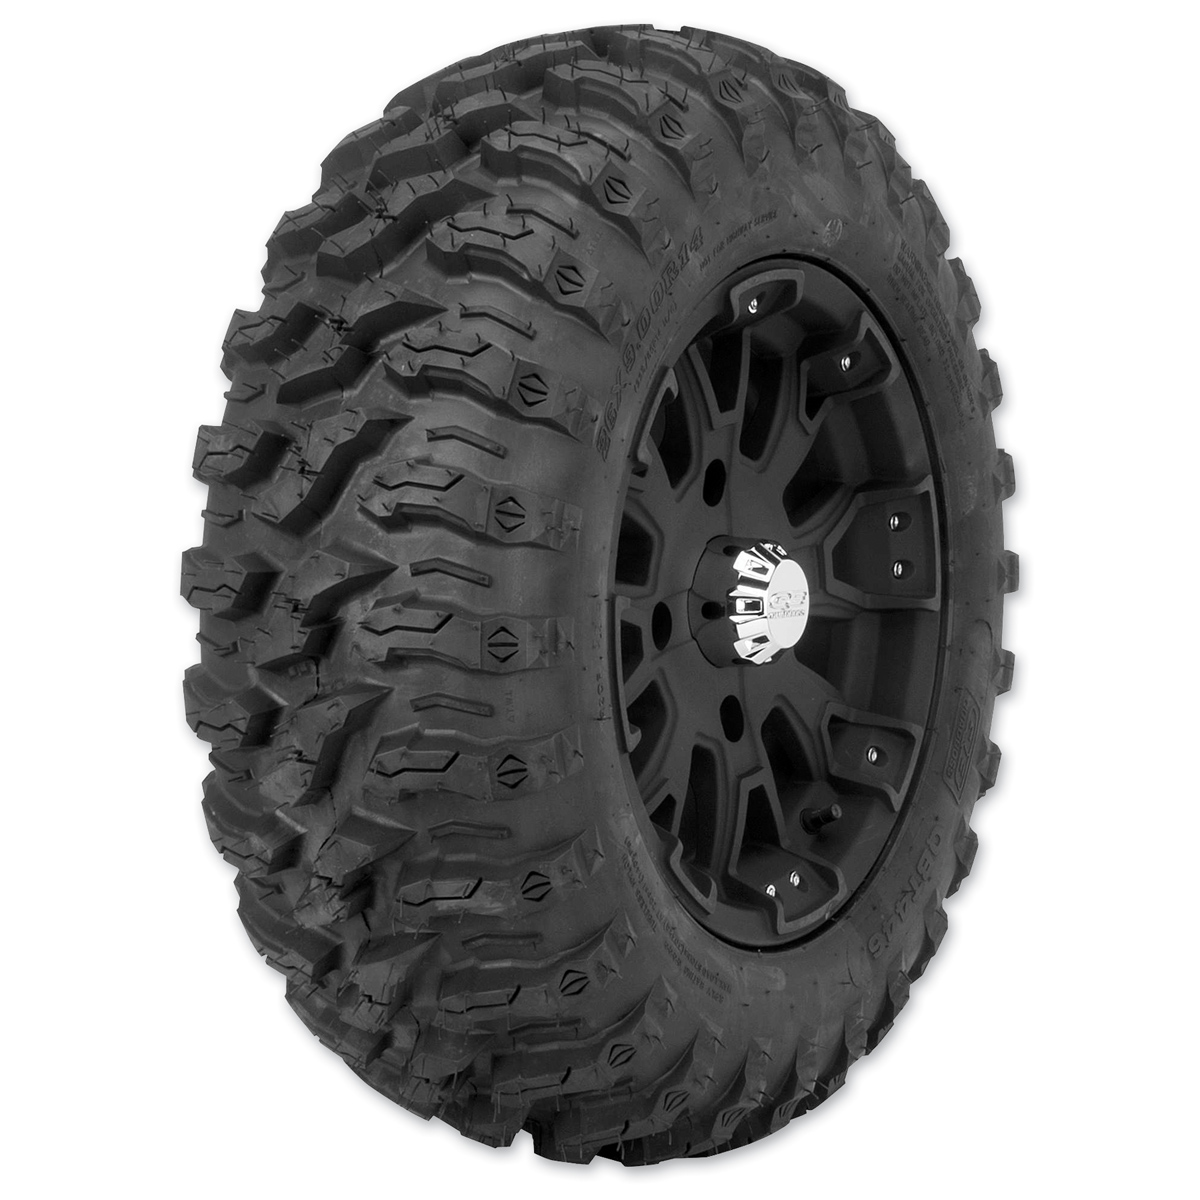 Quadboss QBT446 26X9R14 8-Ply Front Tire